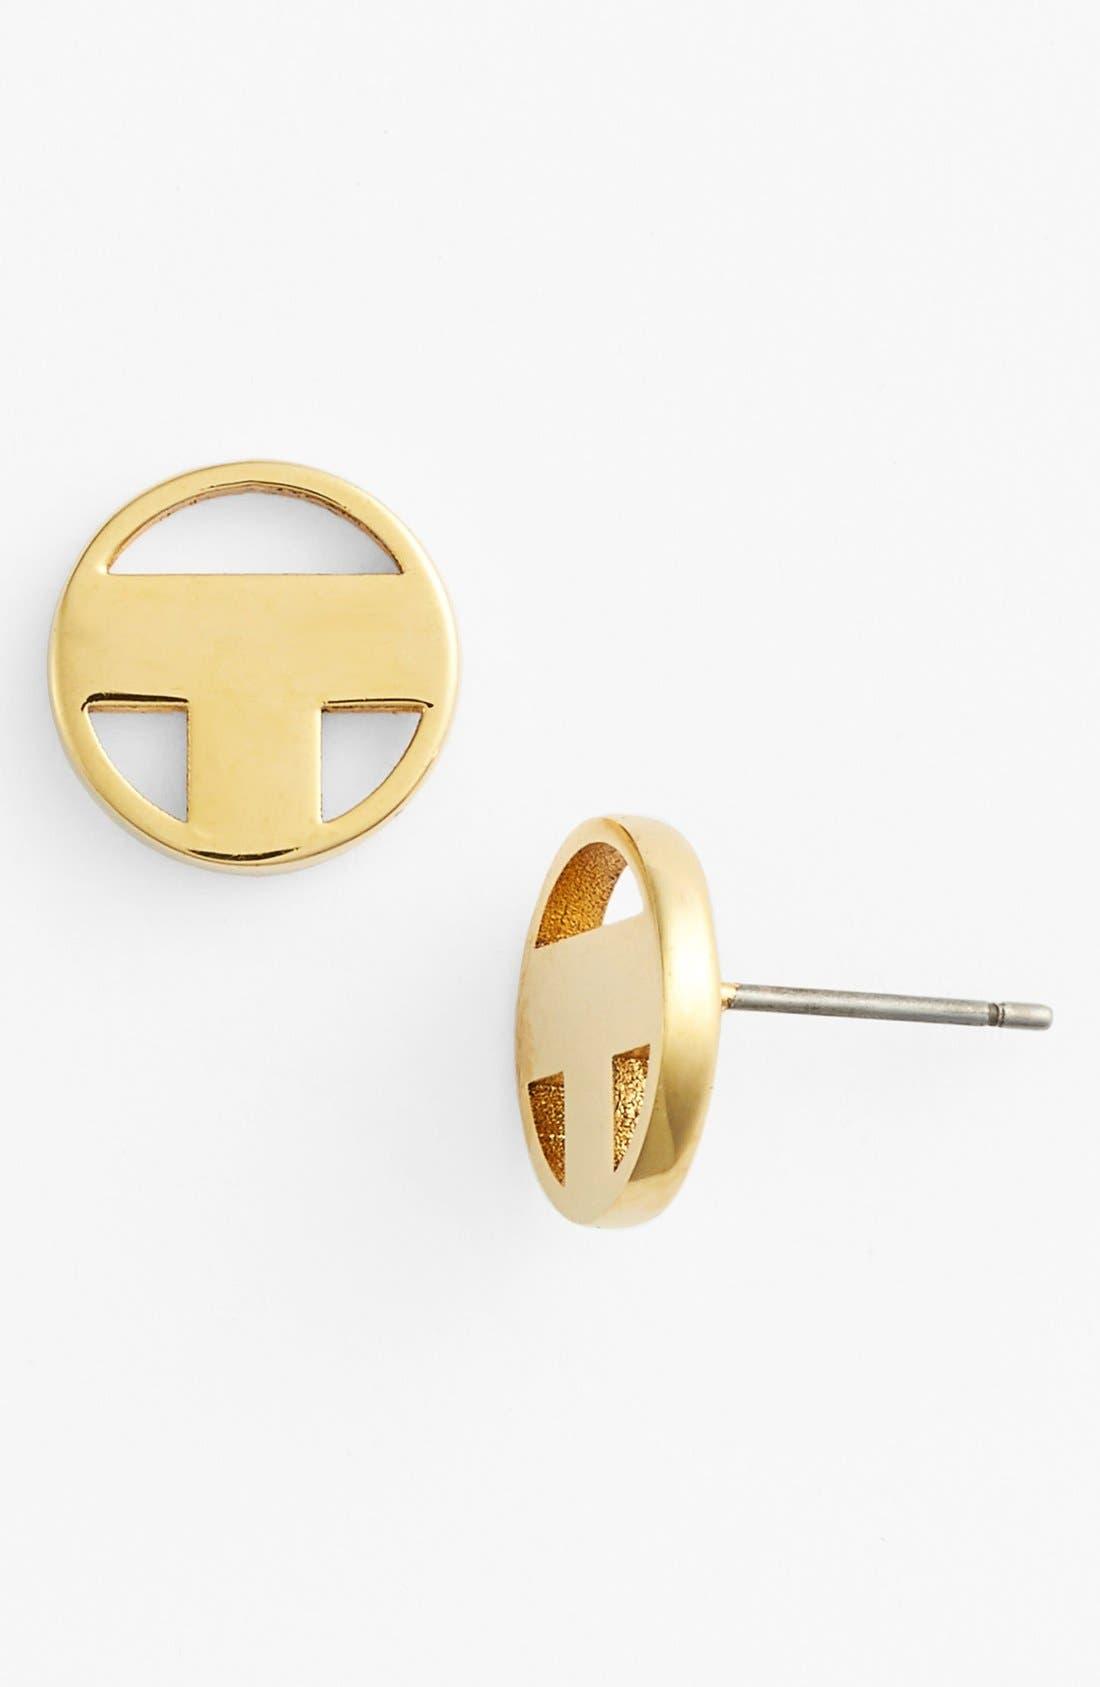 Main Image - Tory Burch Logo Stud Earrings